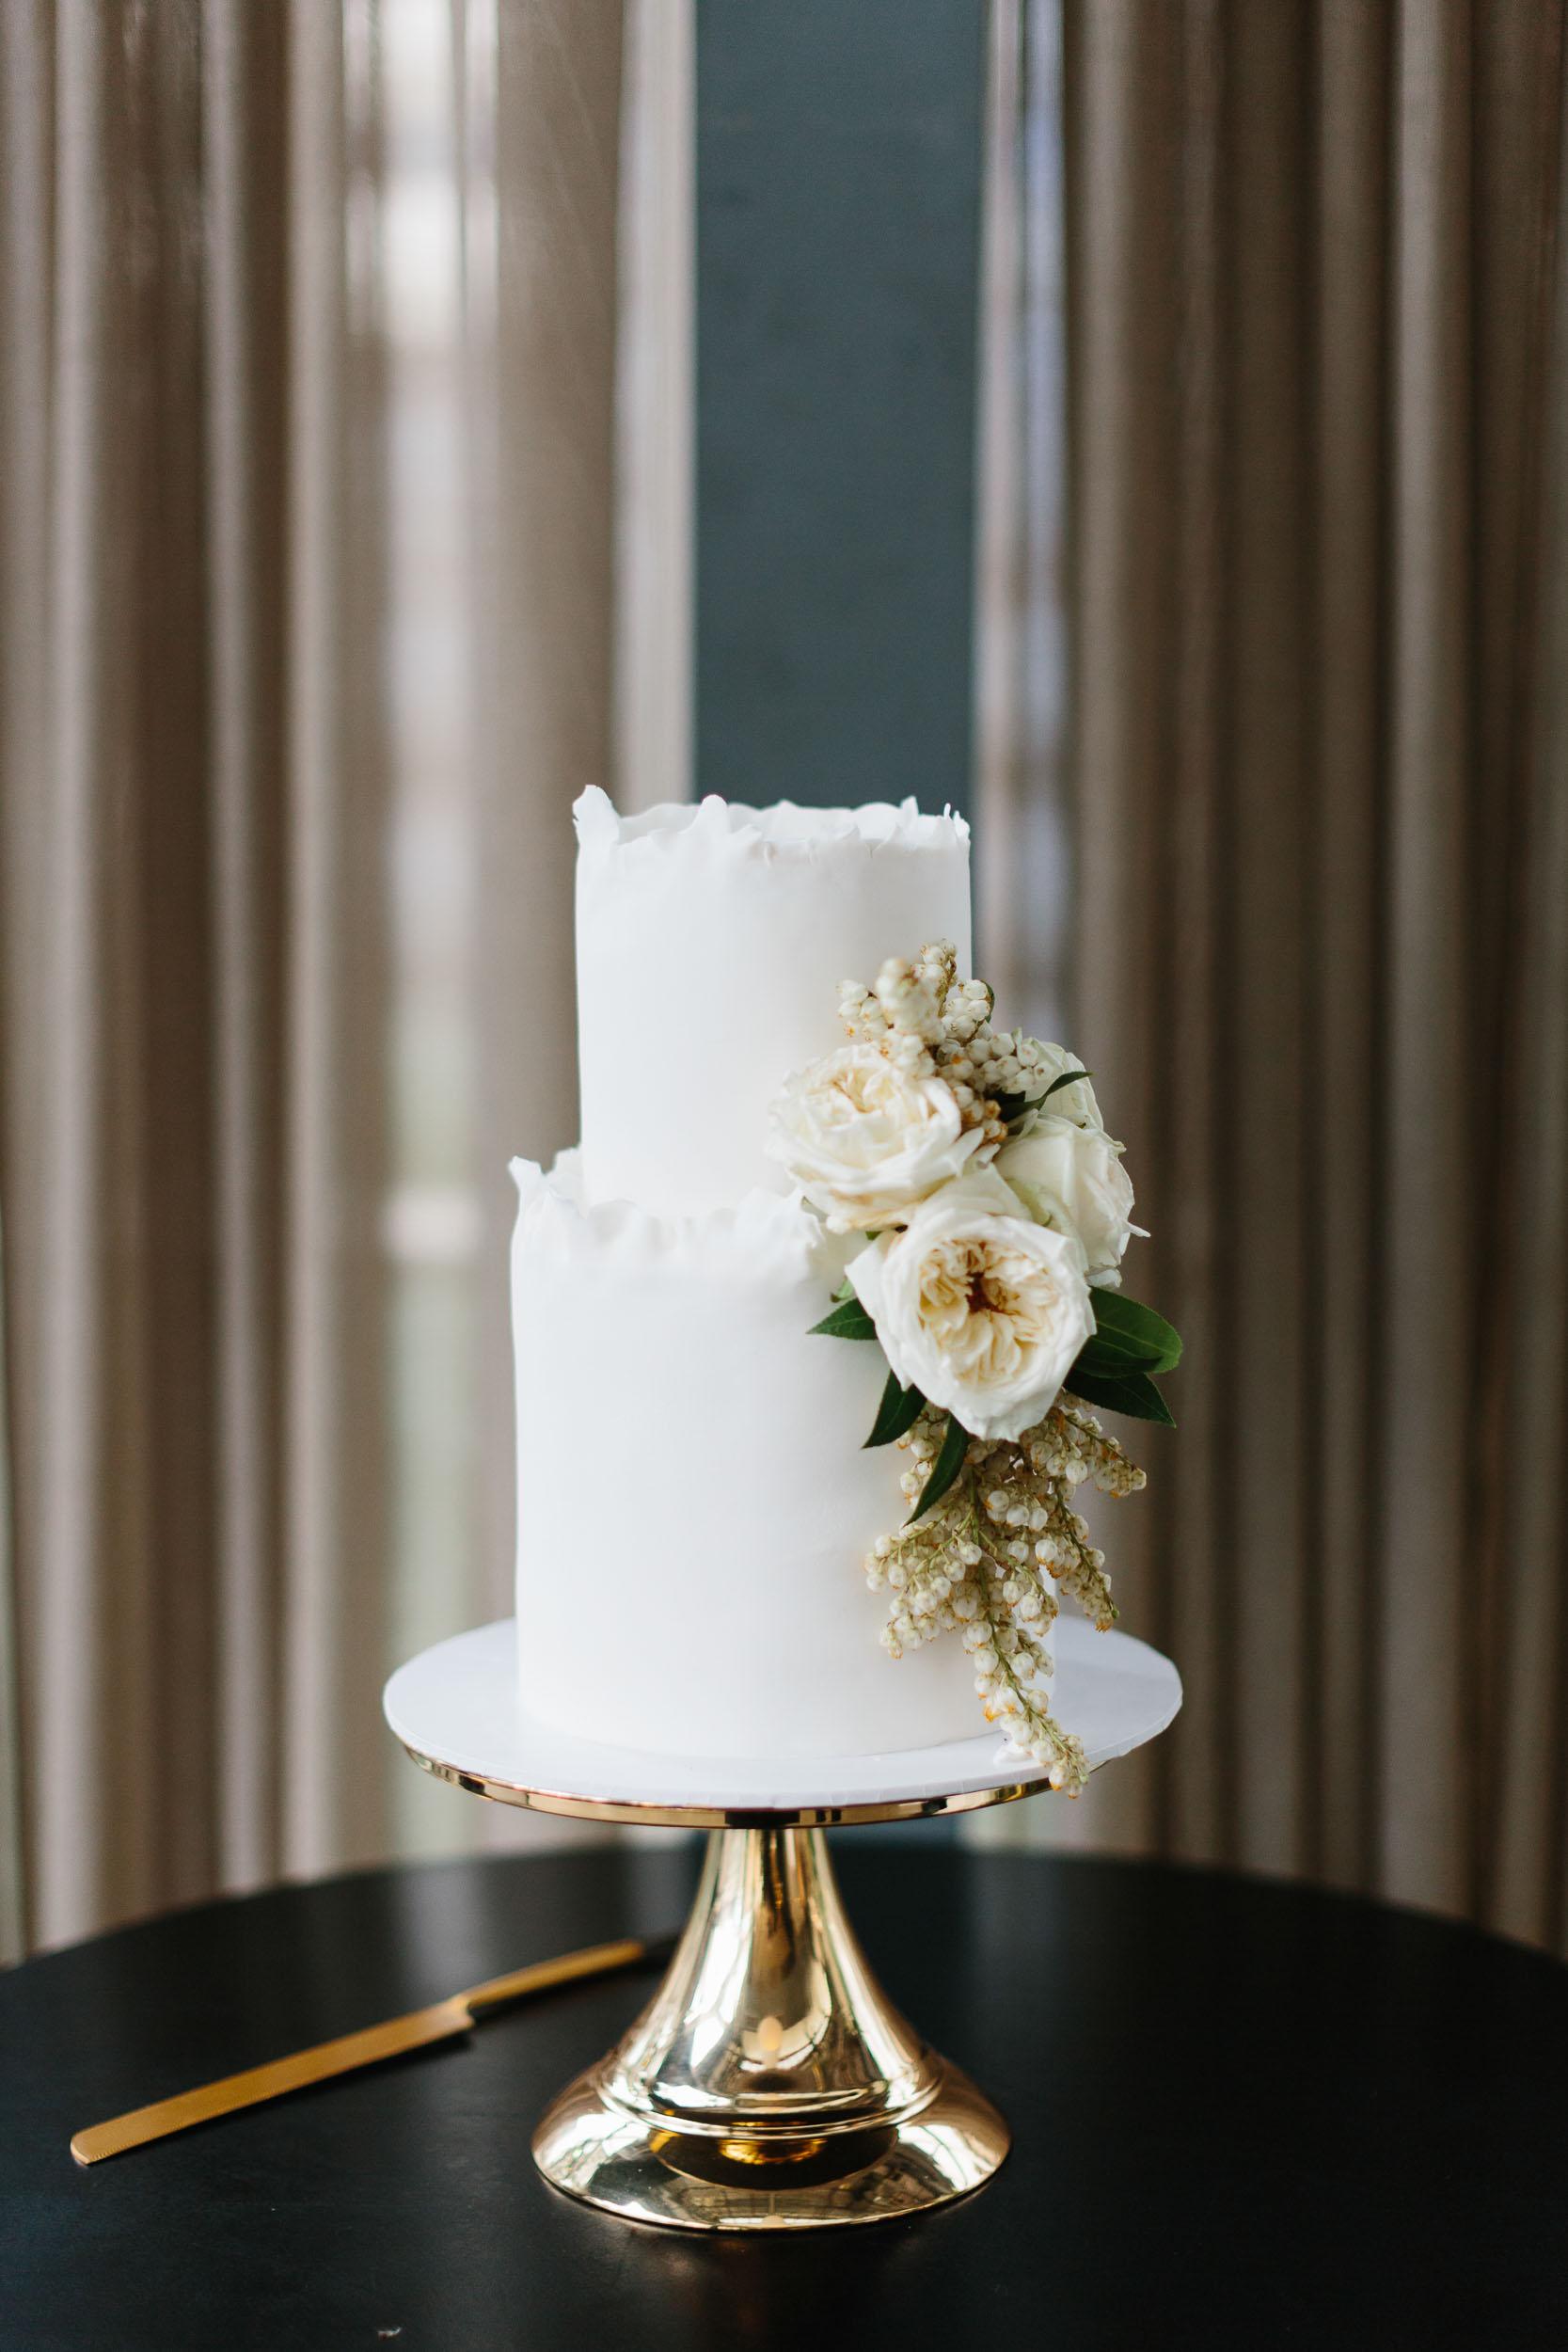 Kas-Richards-Wedding-Photographer-Melbourne-City-Wedding-Alto-Event-Space-Jane-Hill-Bridal-Gown-39.jpg